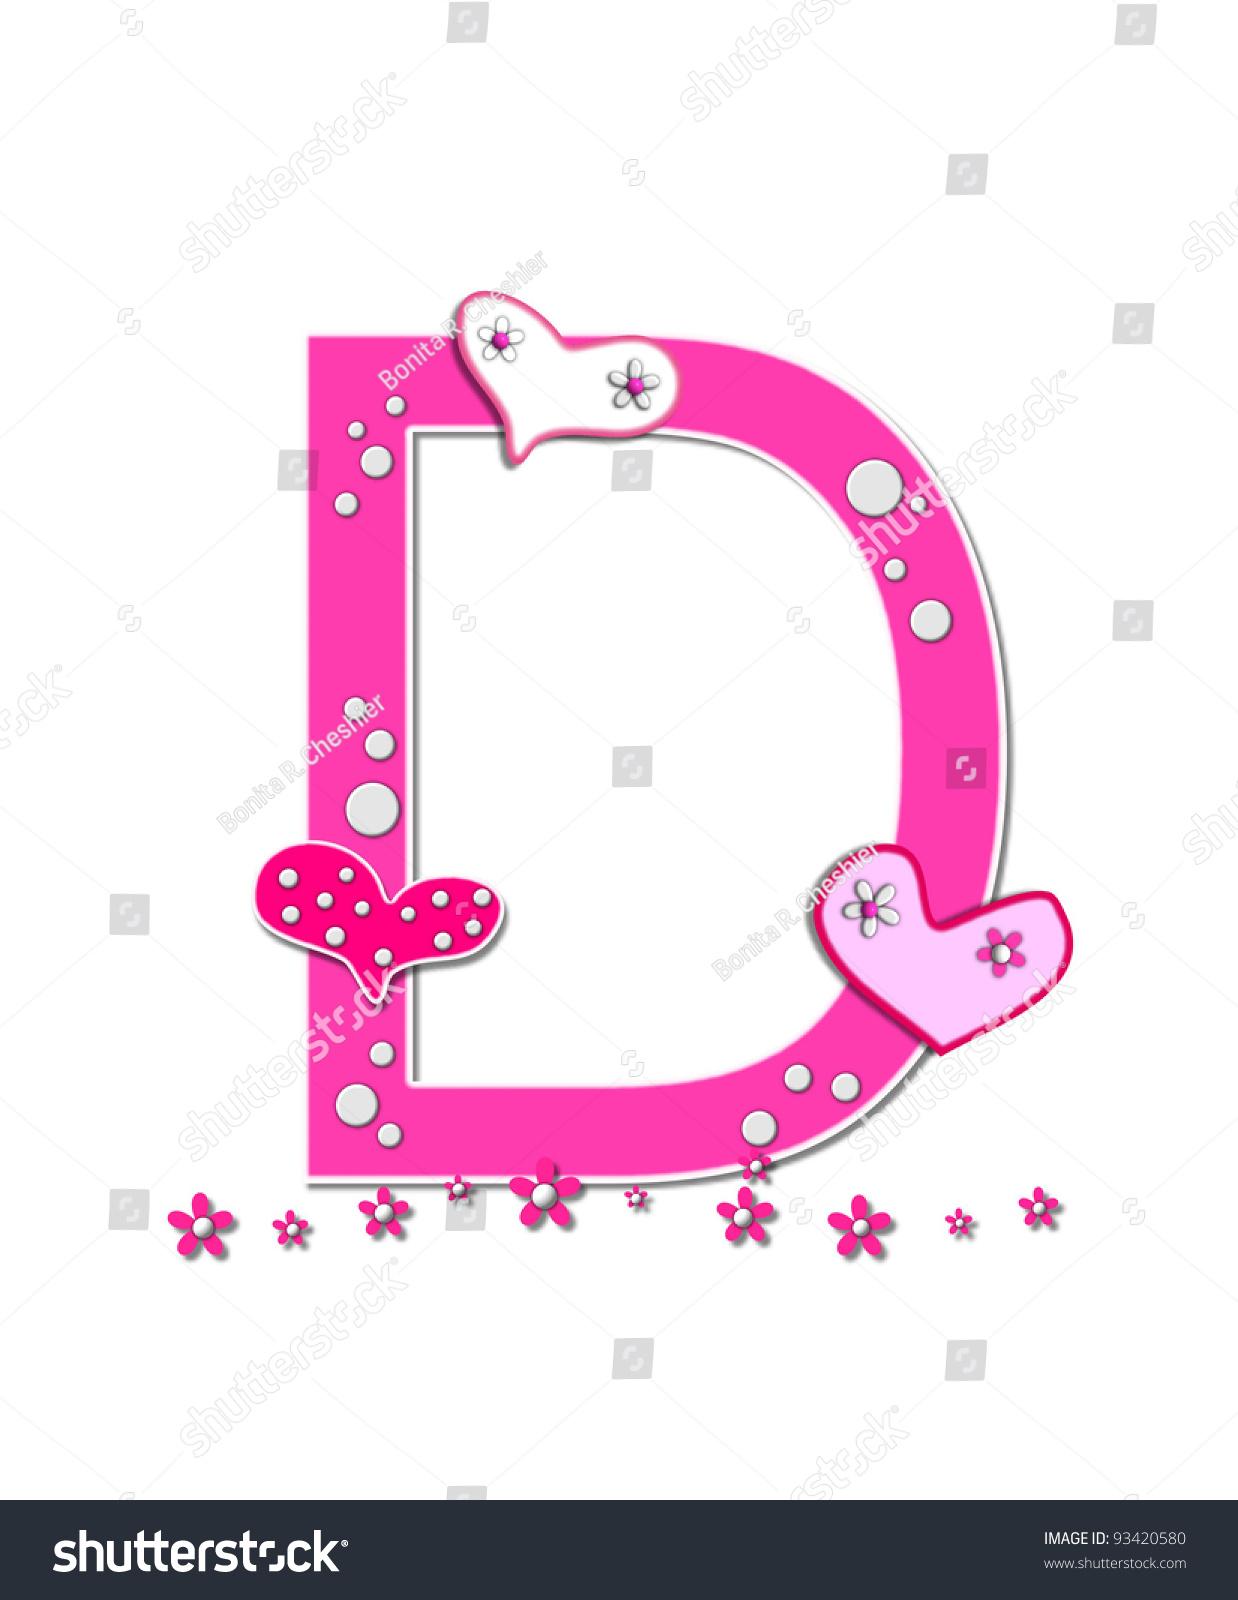 pink_letter_u_sticker-r4dd56e3d3d074dd58ac9700ebb243c1f ... |The Letter U In Pink